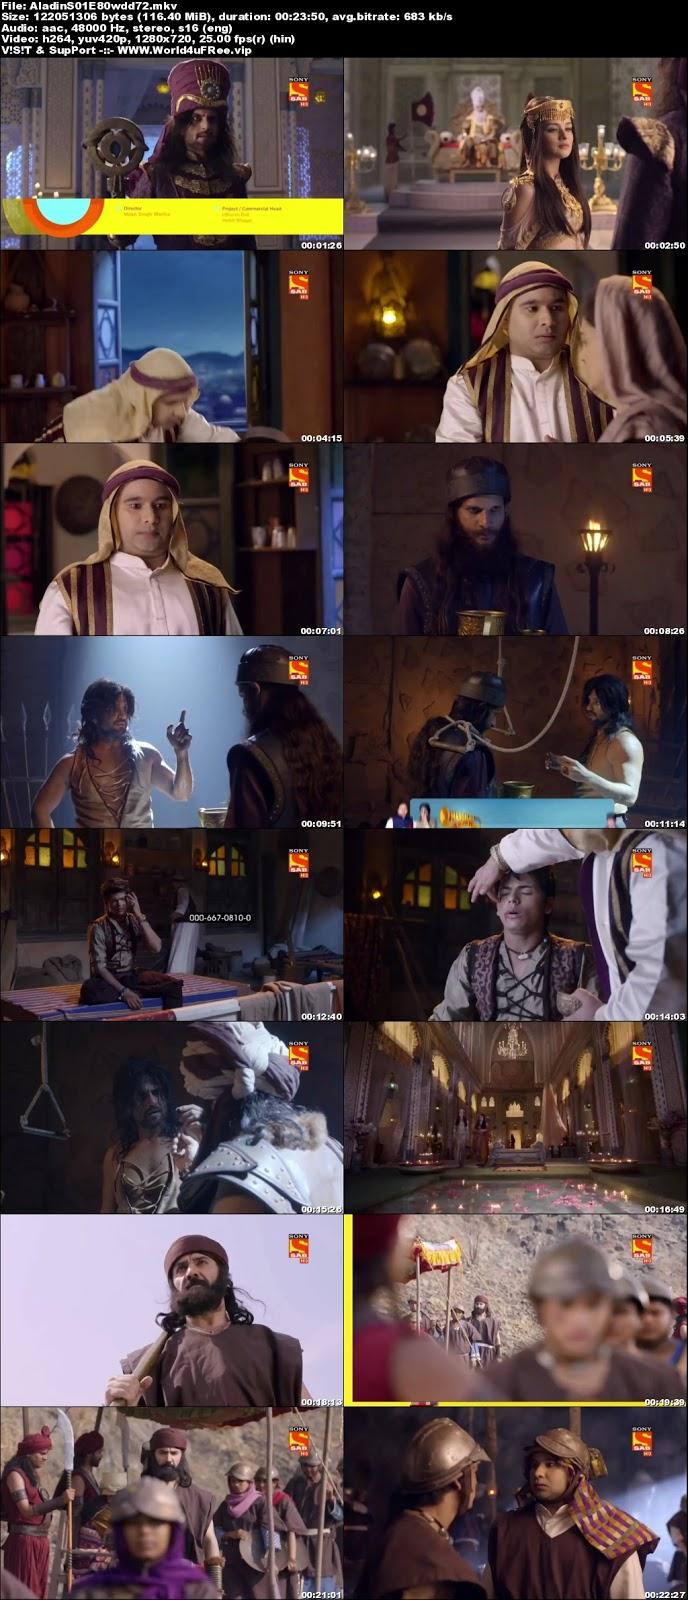 Aladdin 2018 Hindi Season 01 Episode 80 720p WEBRip 150Mb x264 world4ufree.fun tv show Aladdin 2018 hindi tv show Aladdin 2018 Season 11 Sony tv show compressed small size free download or watch online at world4ufree.fun